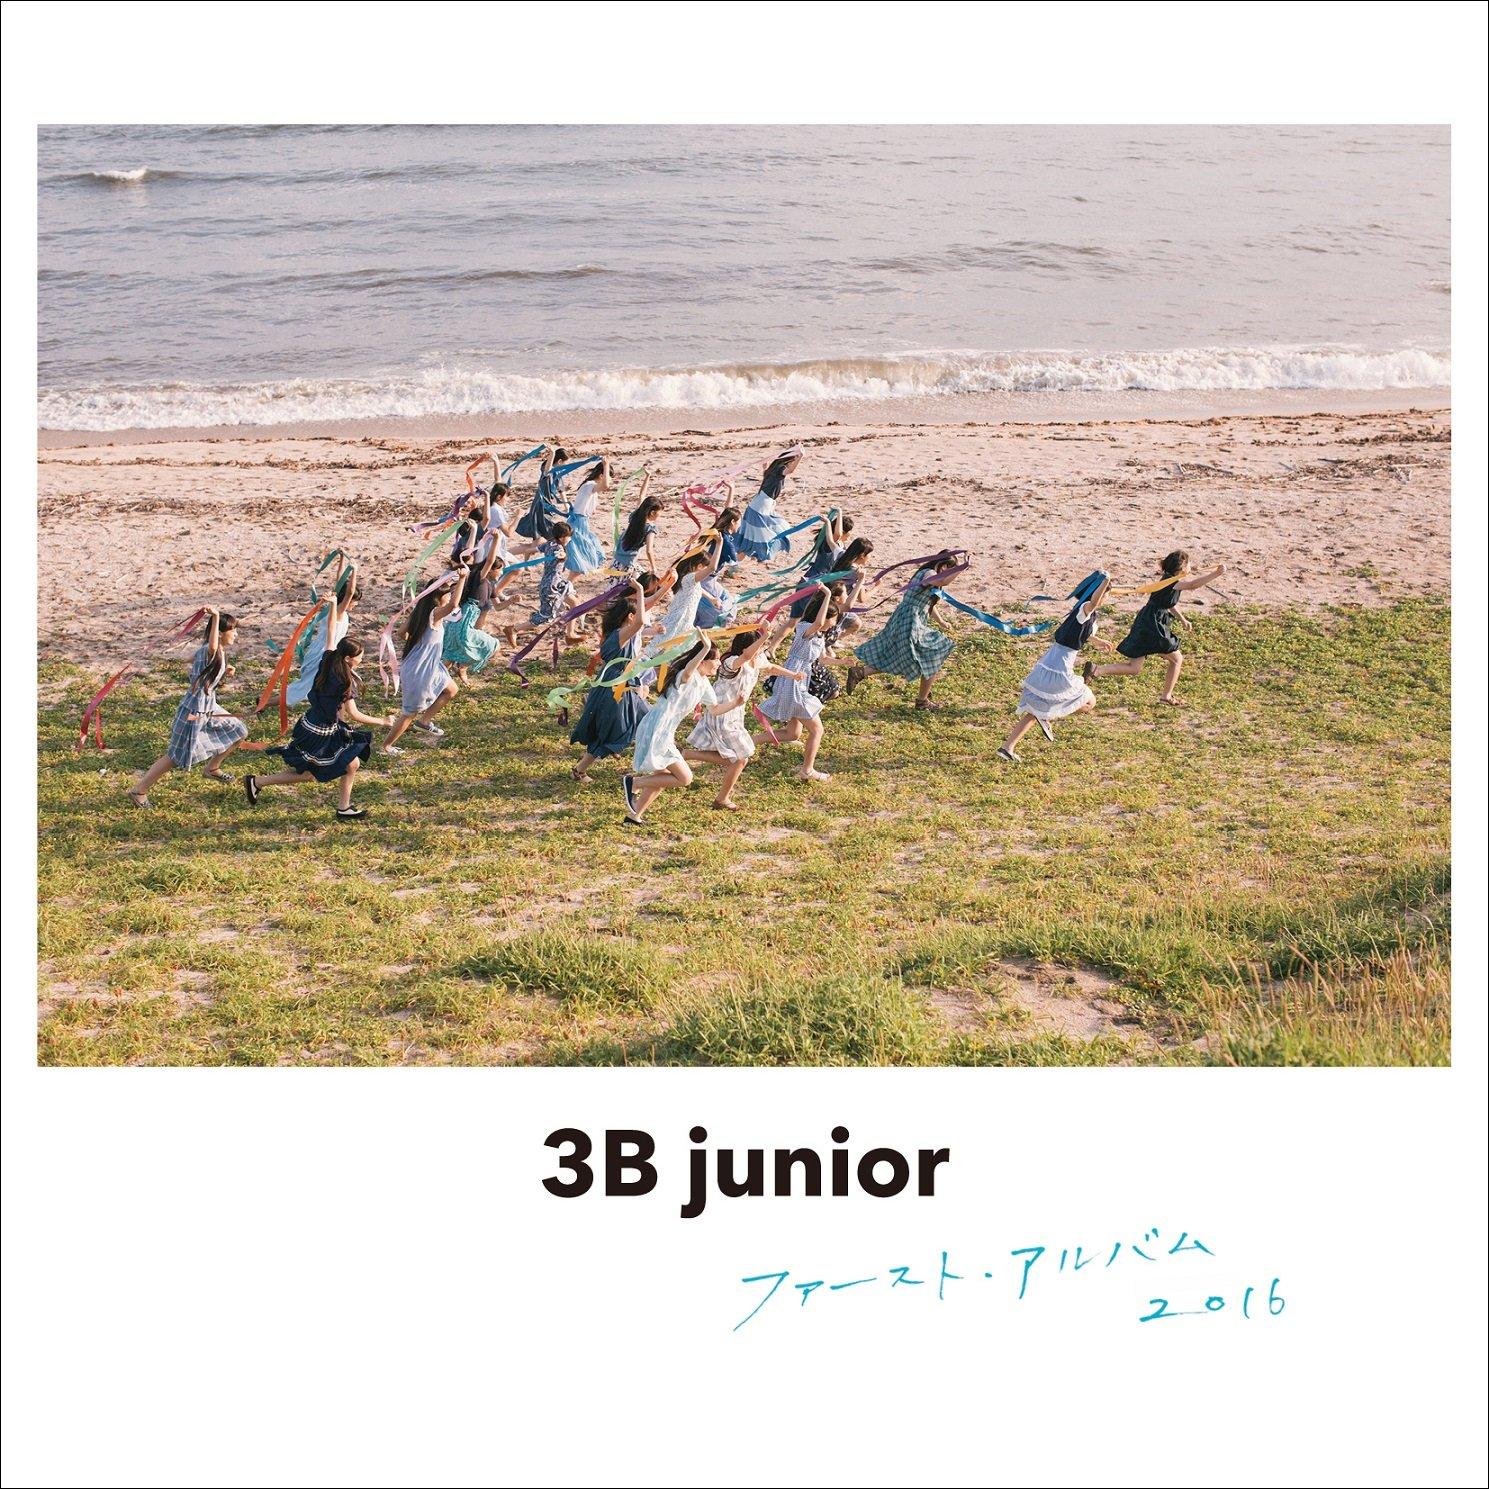 3B junior – 3B junior First Album (Limited Edition) 2016 Bluray ISO